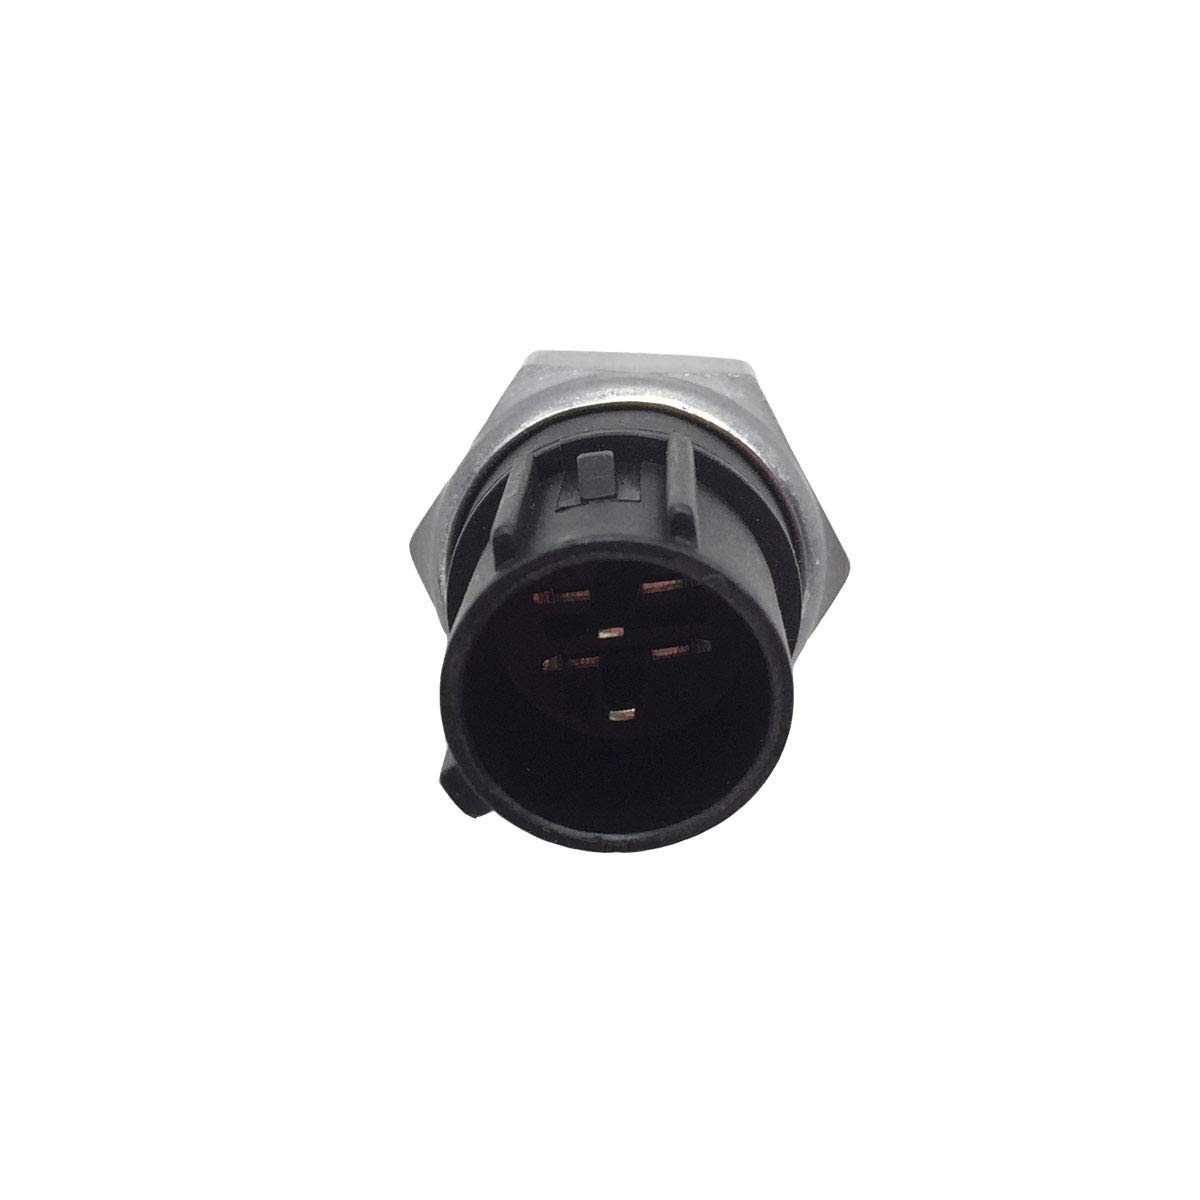 37250PNEG01 Oil Pressure Switch 37250-PNE-G01 for Acura rdx Honda Accord City Civic